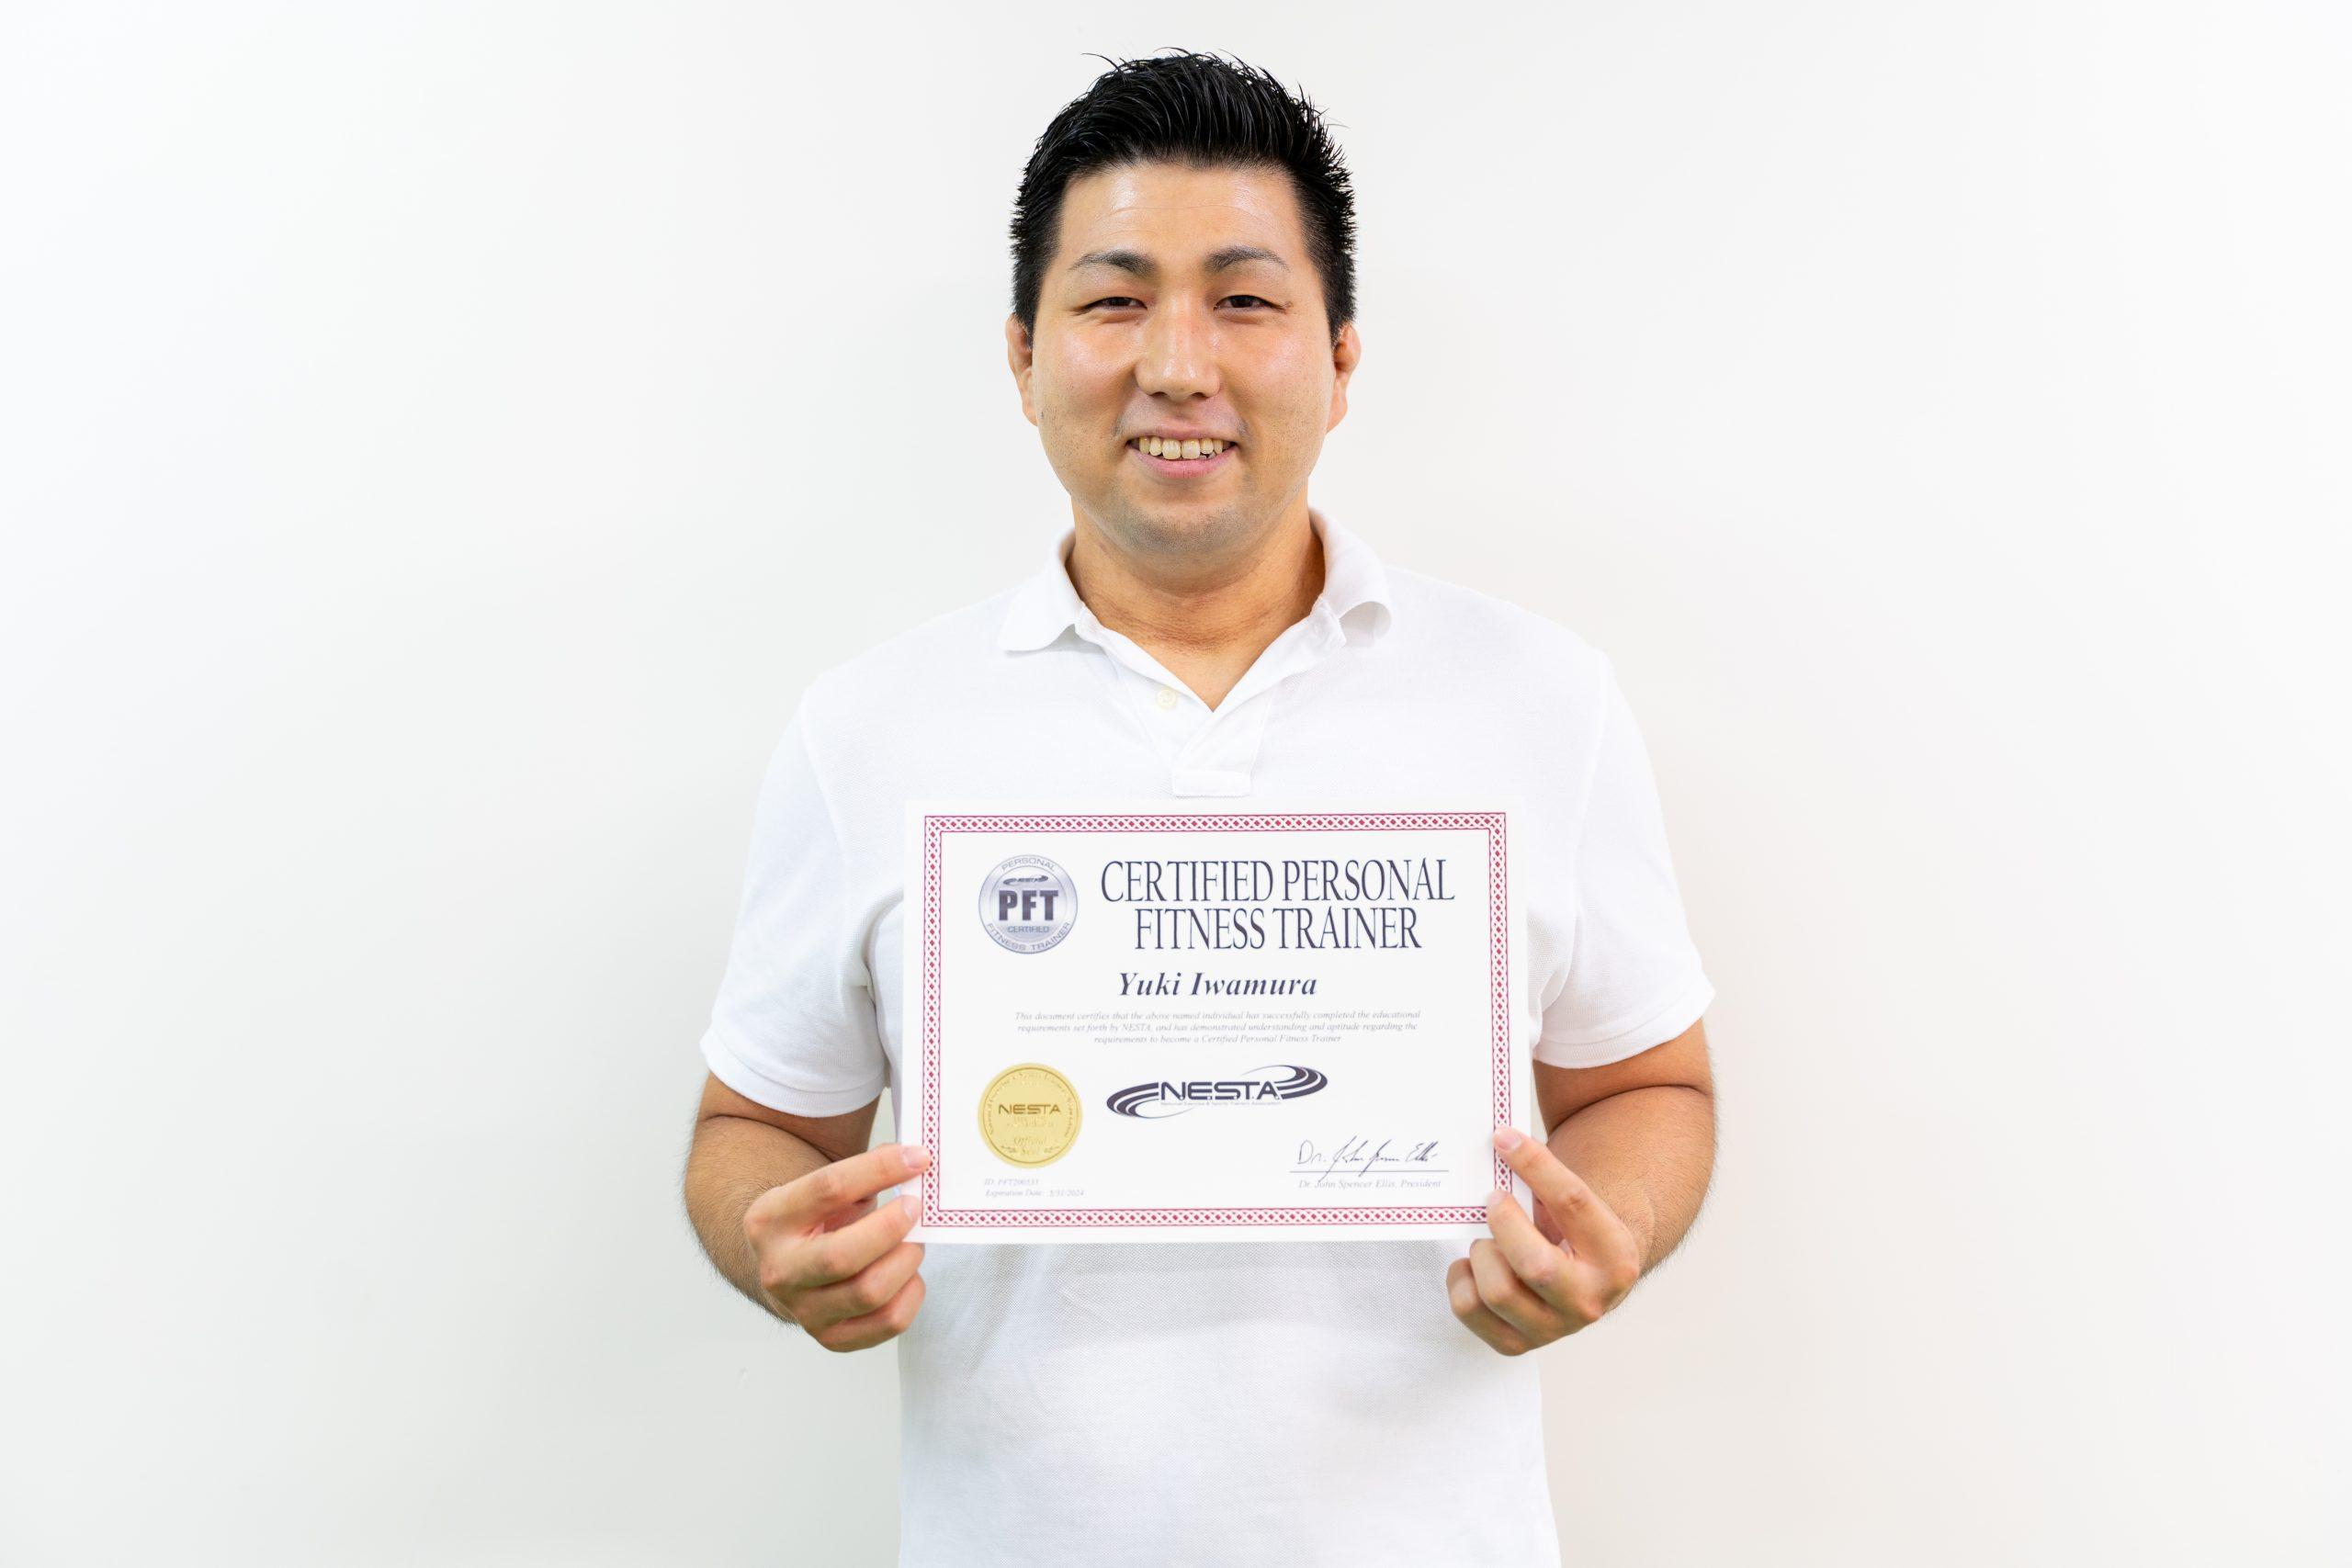 NESTA-PFT資格取得 卒業生のインタビュー岩村さん